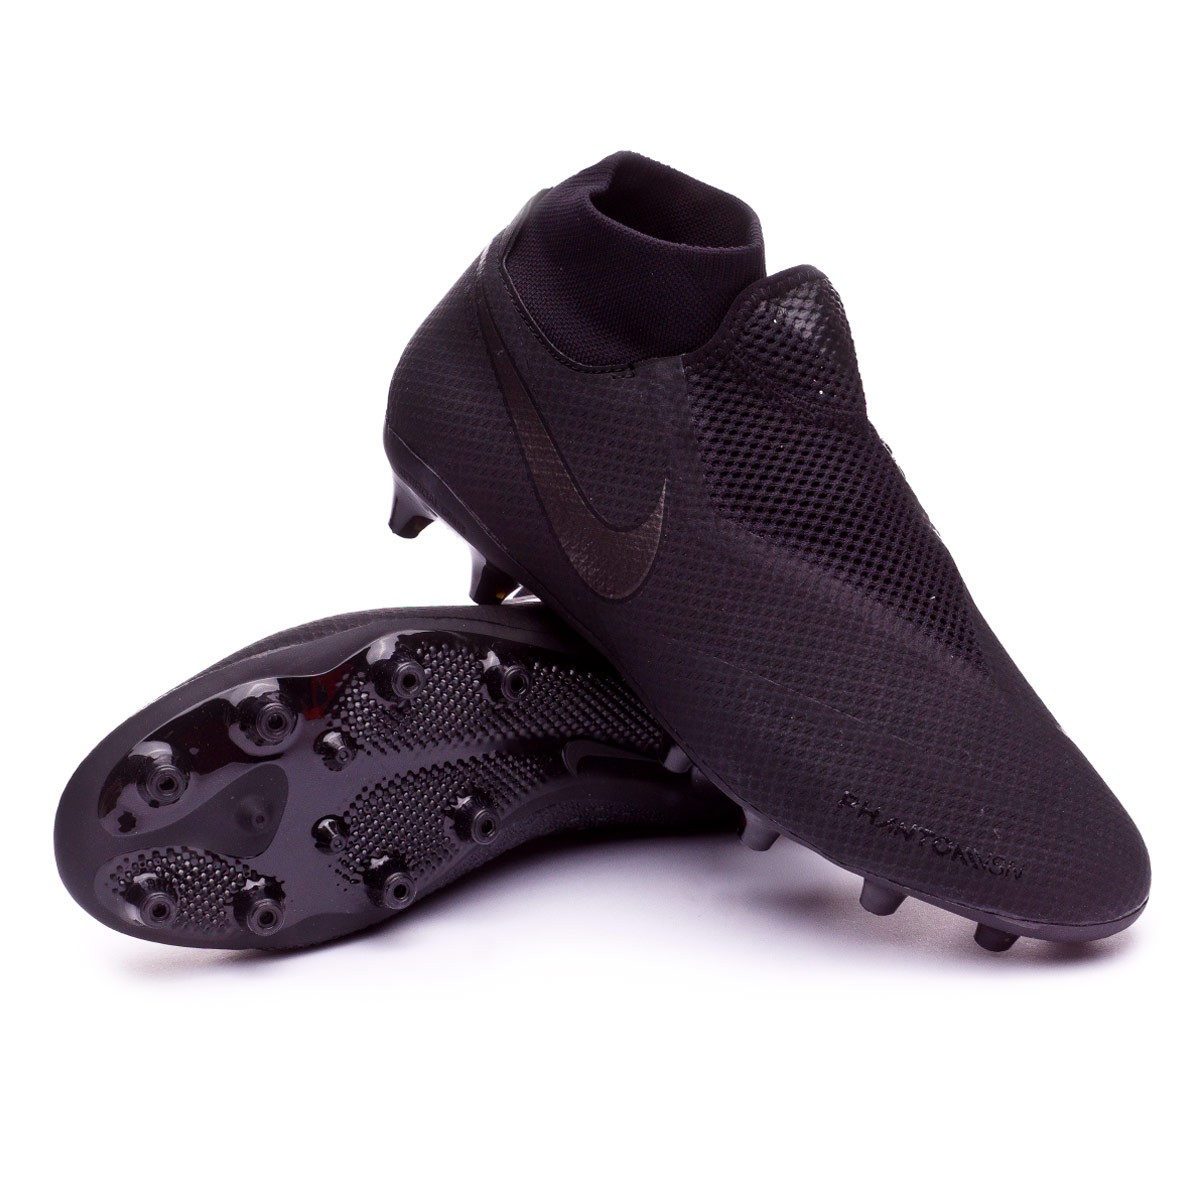 Boot Nike Phantom Vision Pro DF AG-Pro Black - Football store Fútbol ... 69d36328b10e3